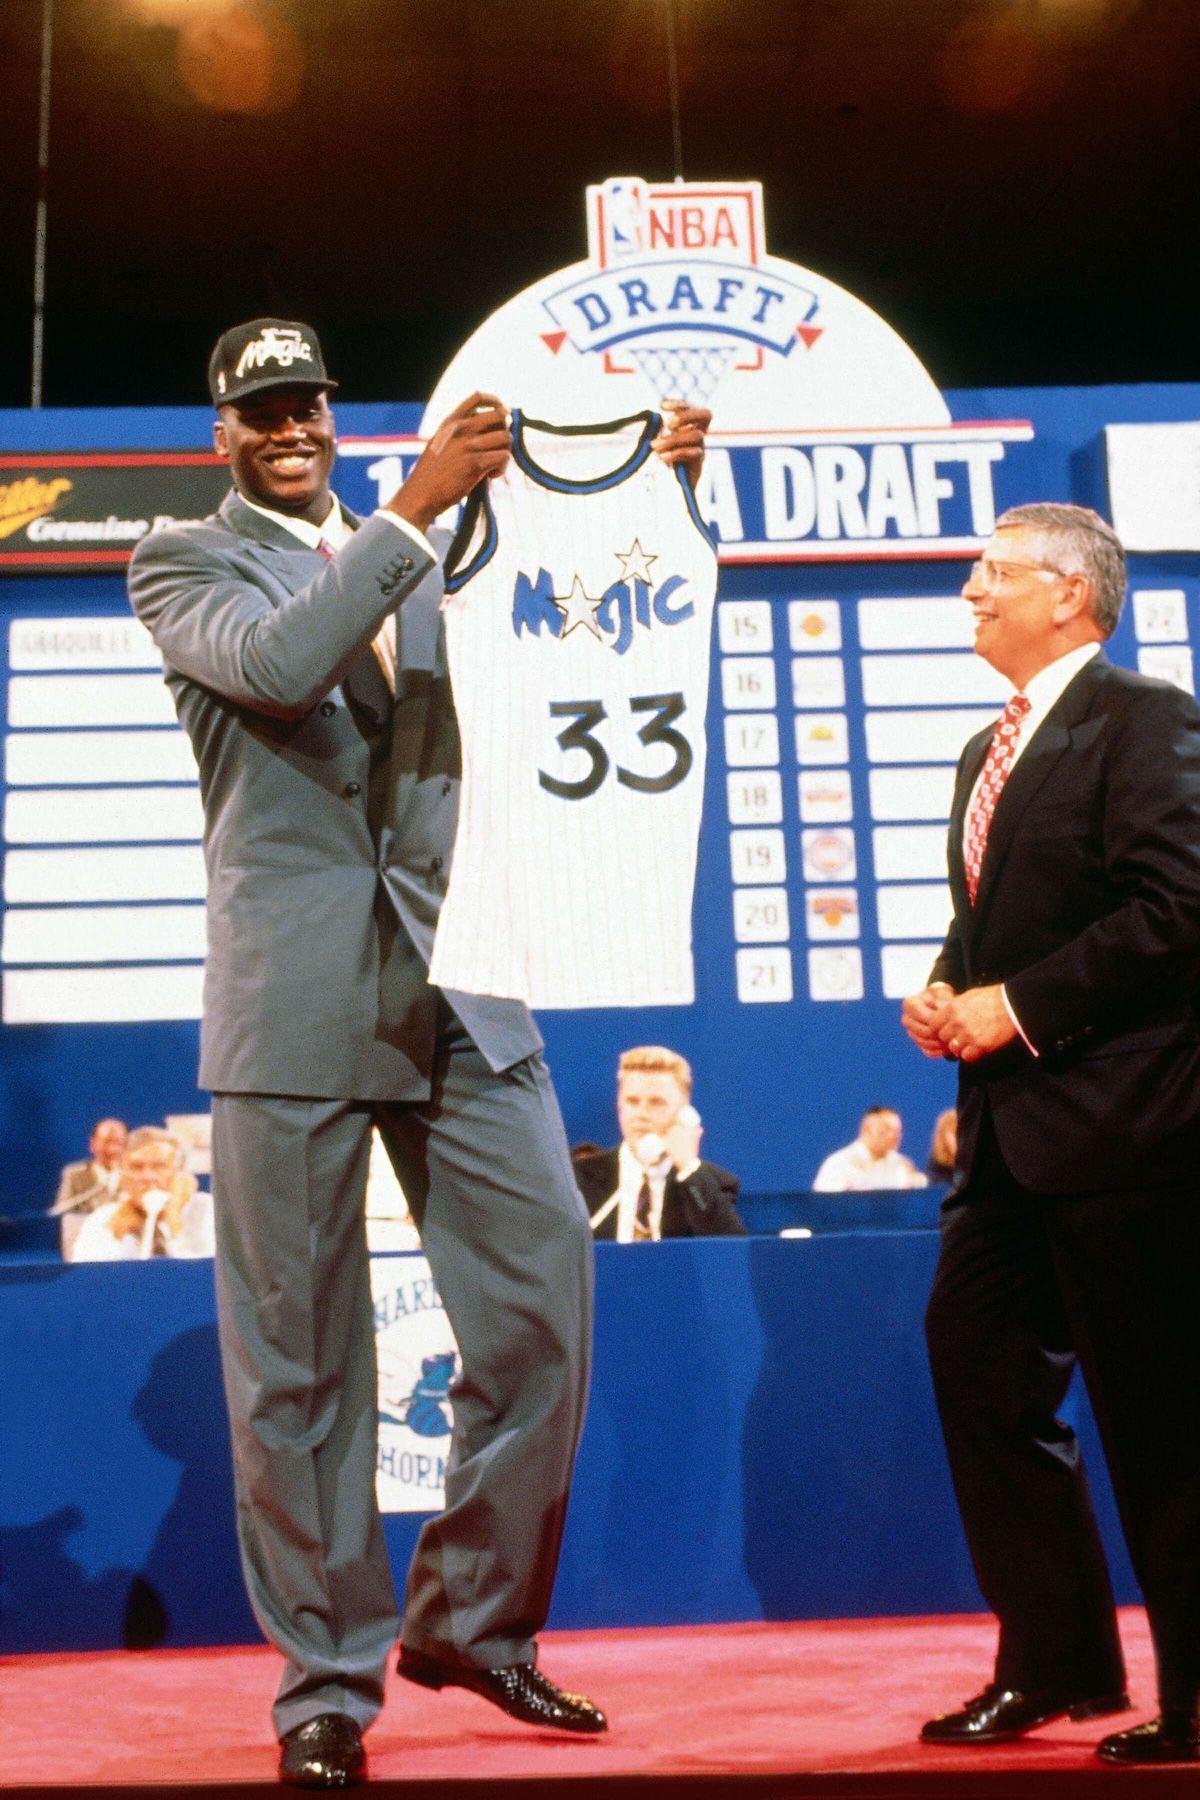 1992 NBA Draft - Orlando Magic first round draft choice Shaquille O'Neal